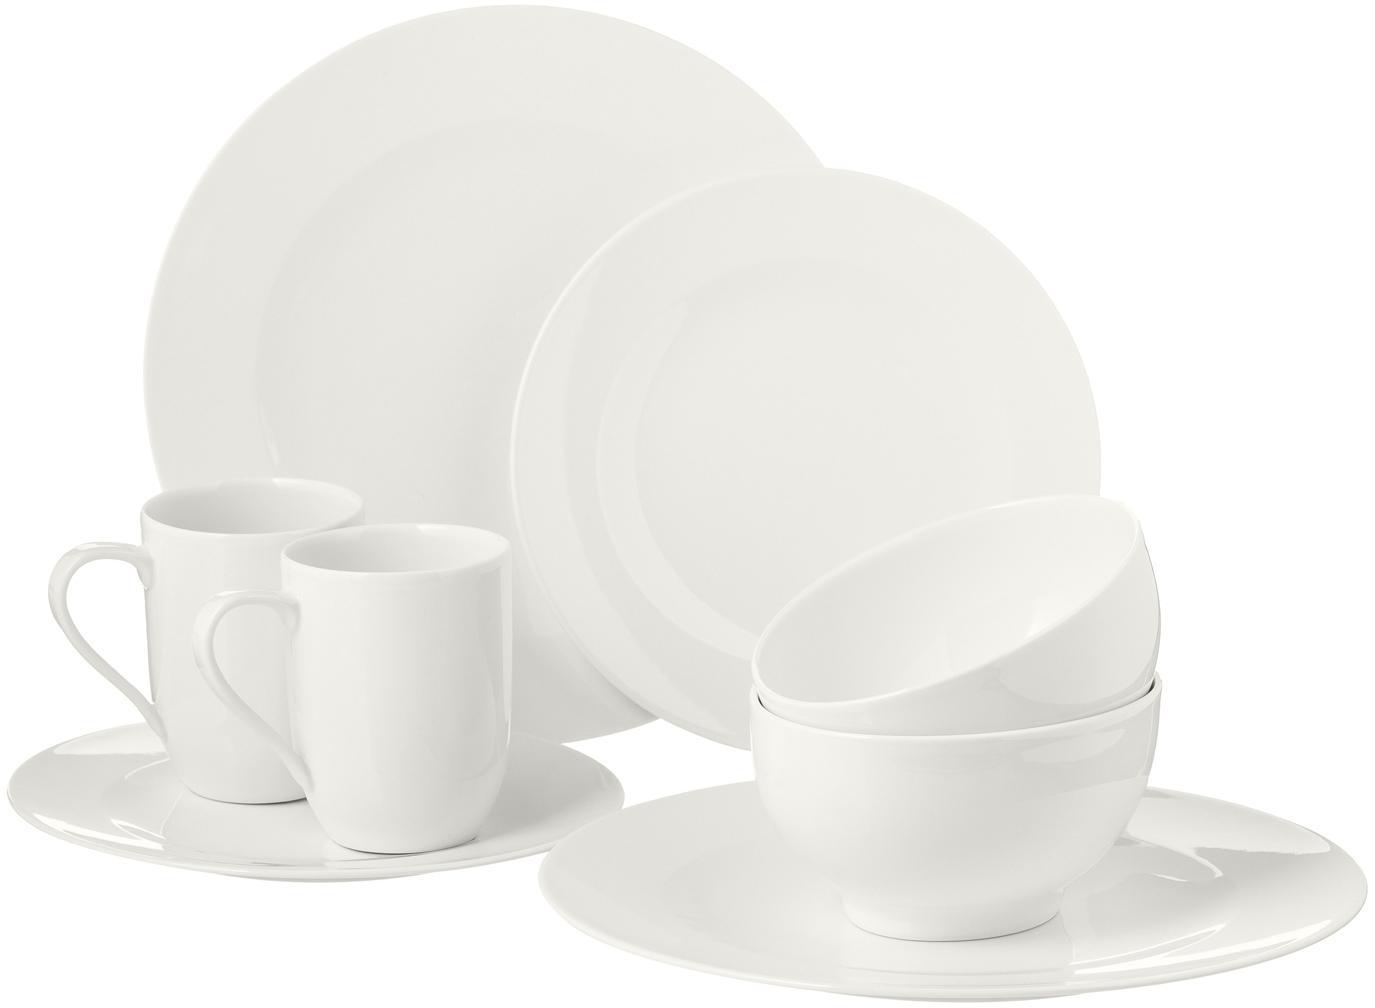 Set di stoviglie in porcellana For Me 16 pz, Porcellana, Bianco latteo, Set in varie misure